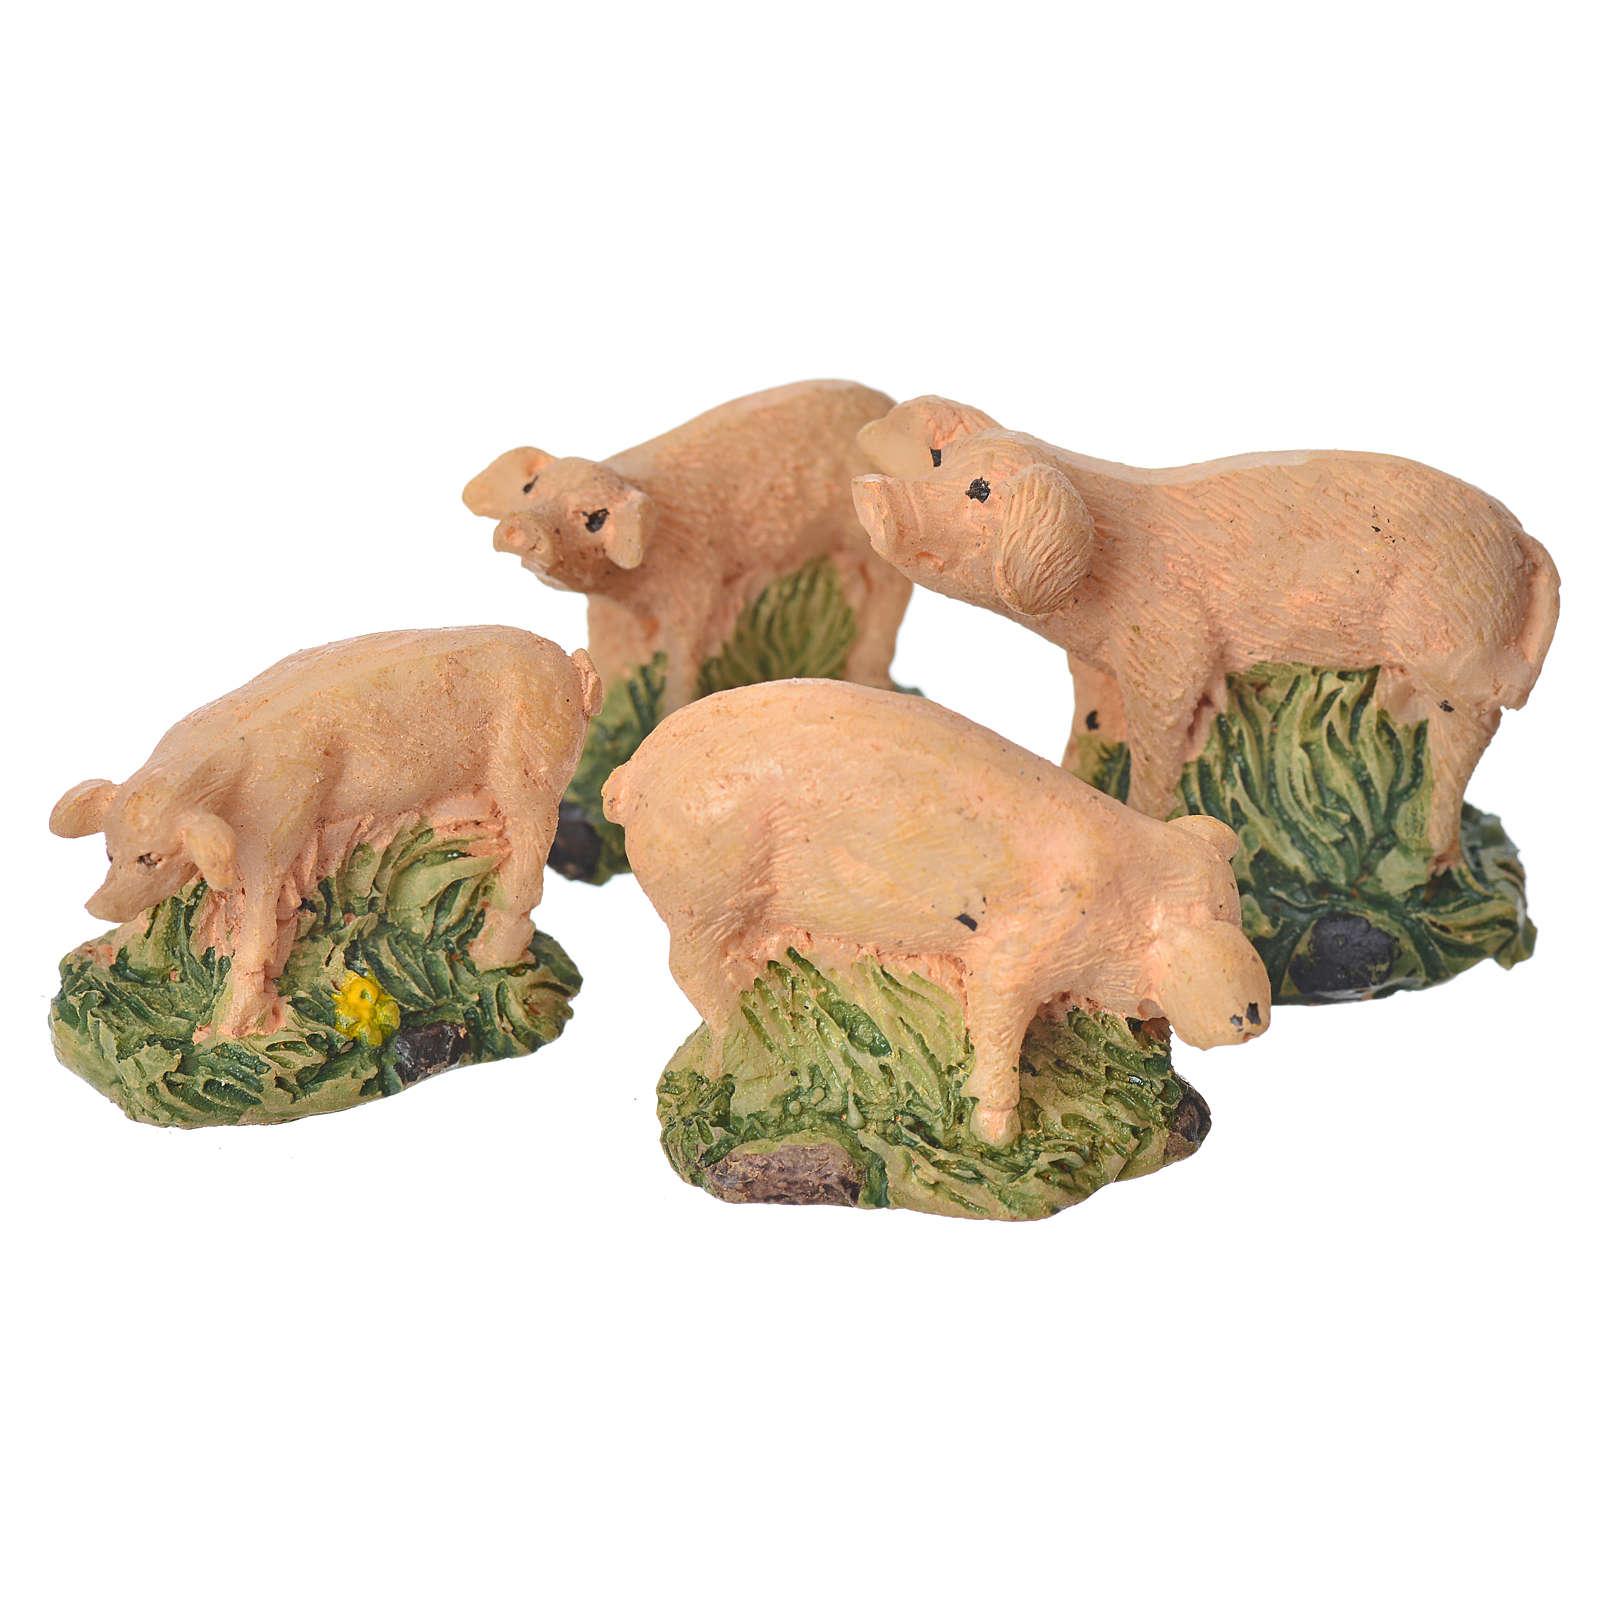 Nativity figurine, resin pigs, 4 pieces 10cm 3